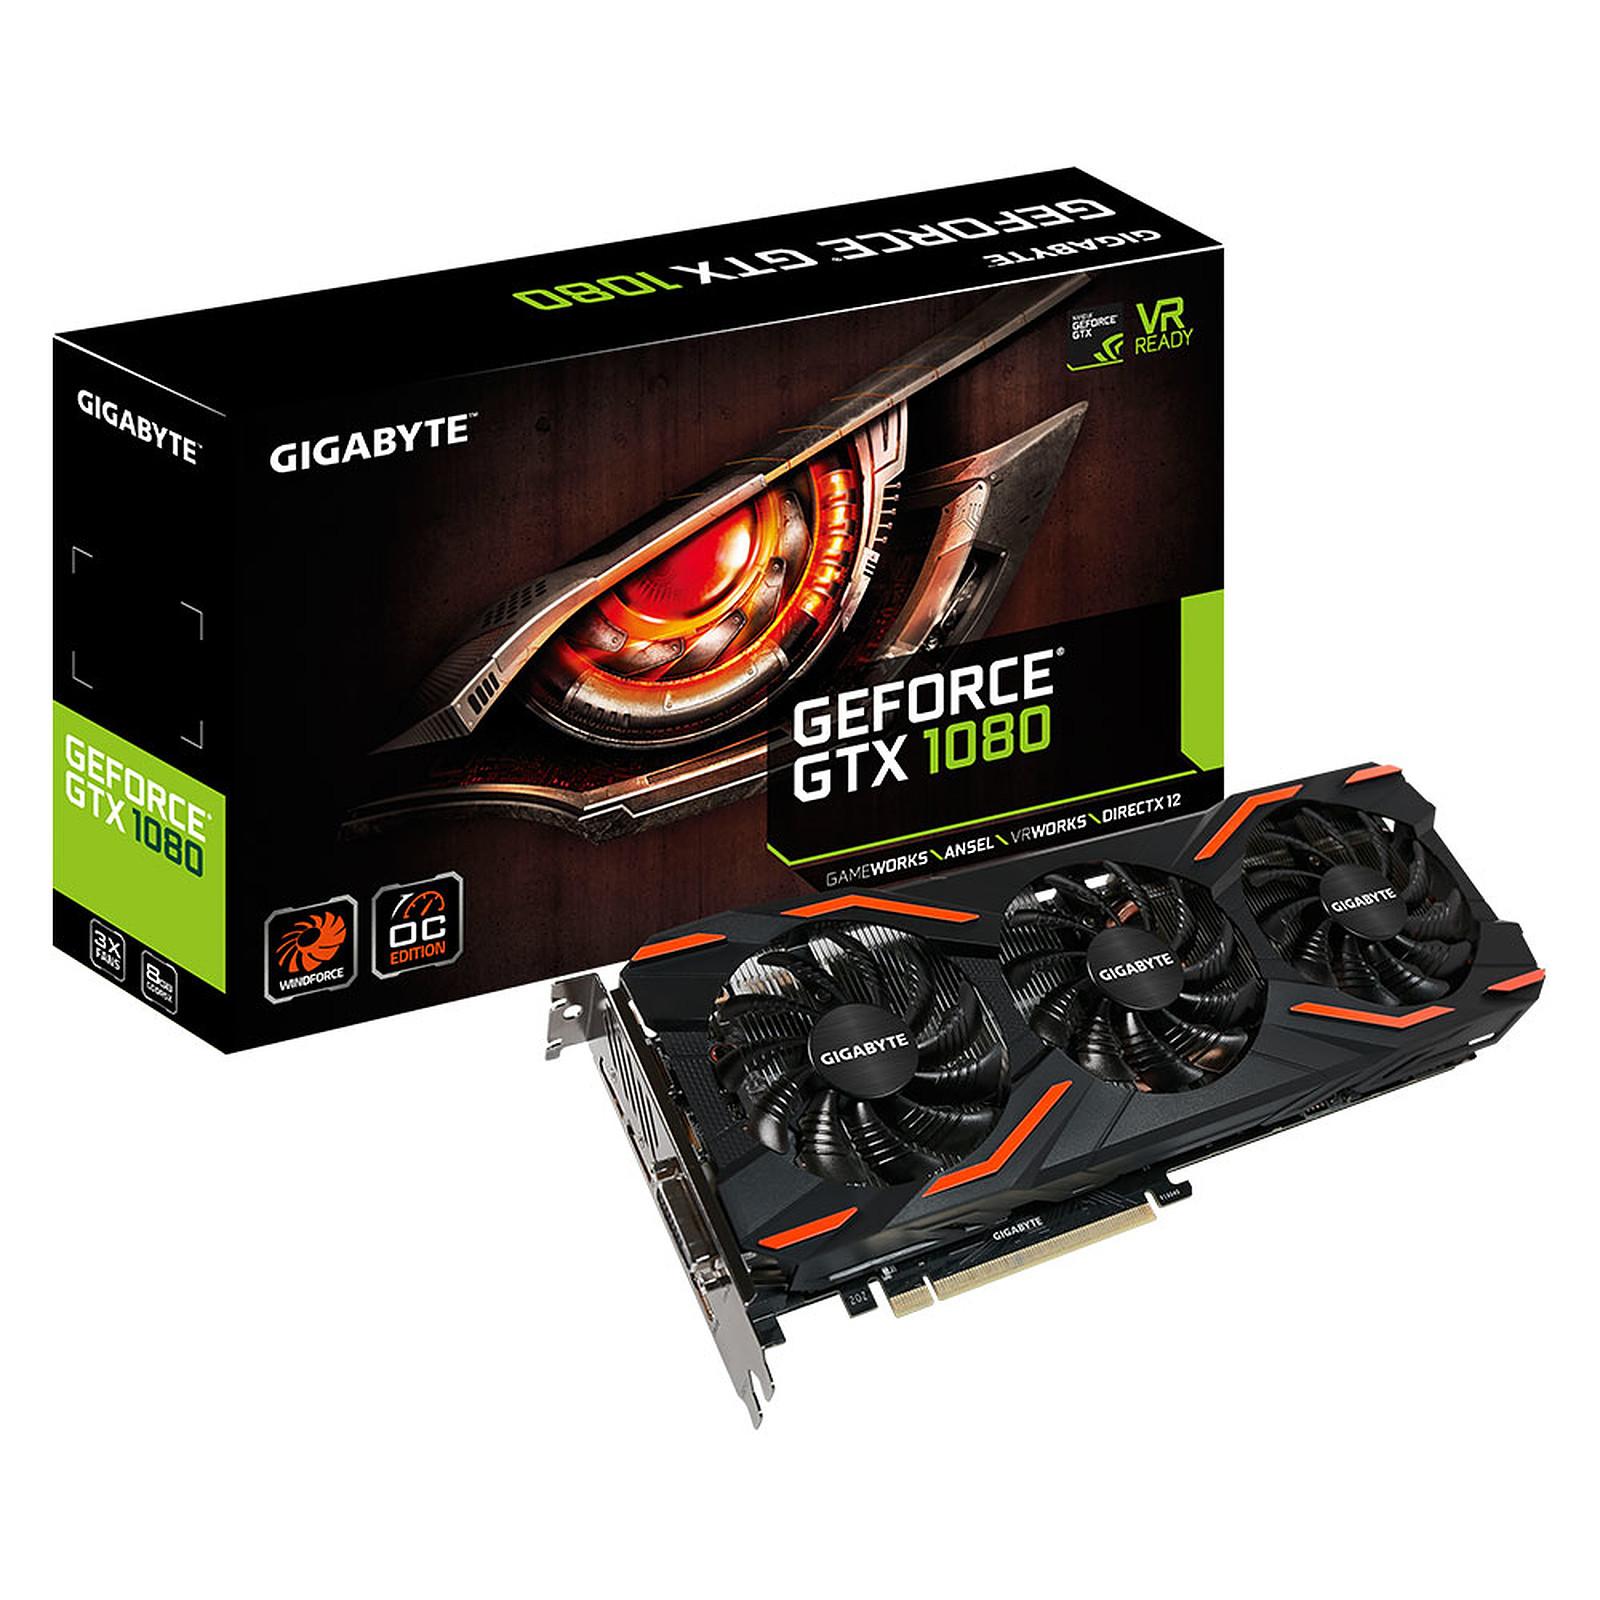 Gigabyte GeForce GTX 1080 WINDFORCE OC GV-N1080WF3OC-8GD